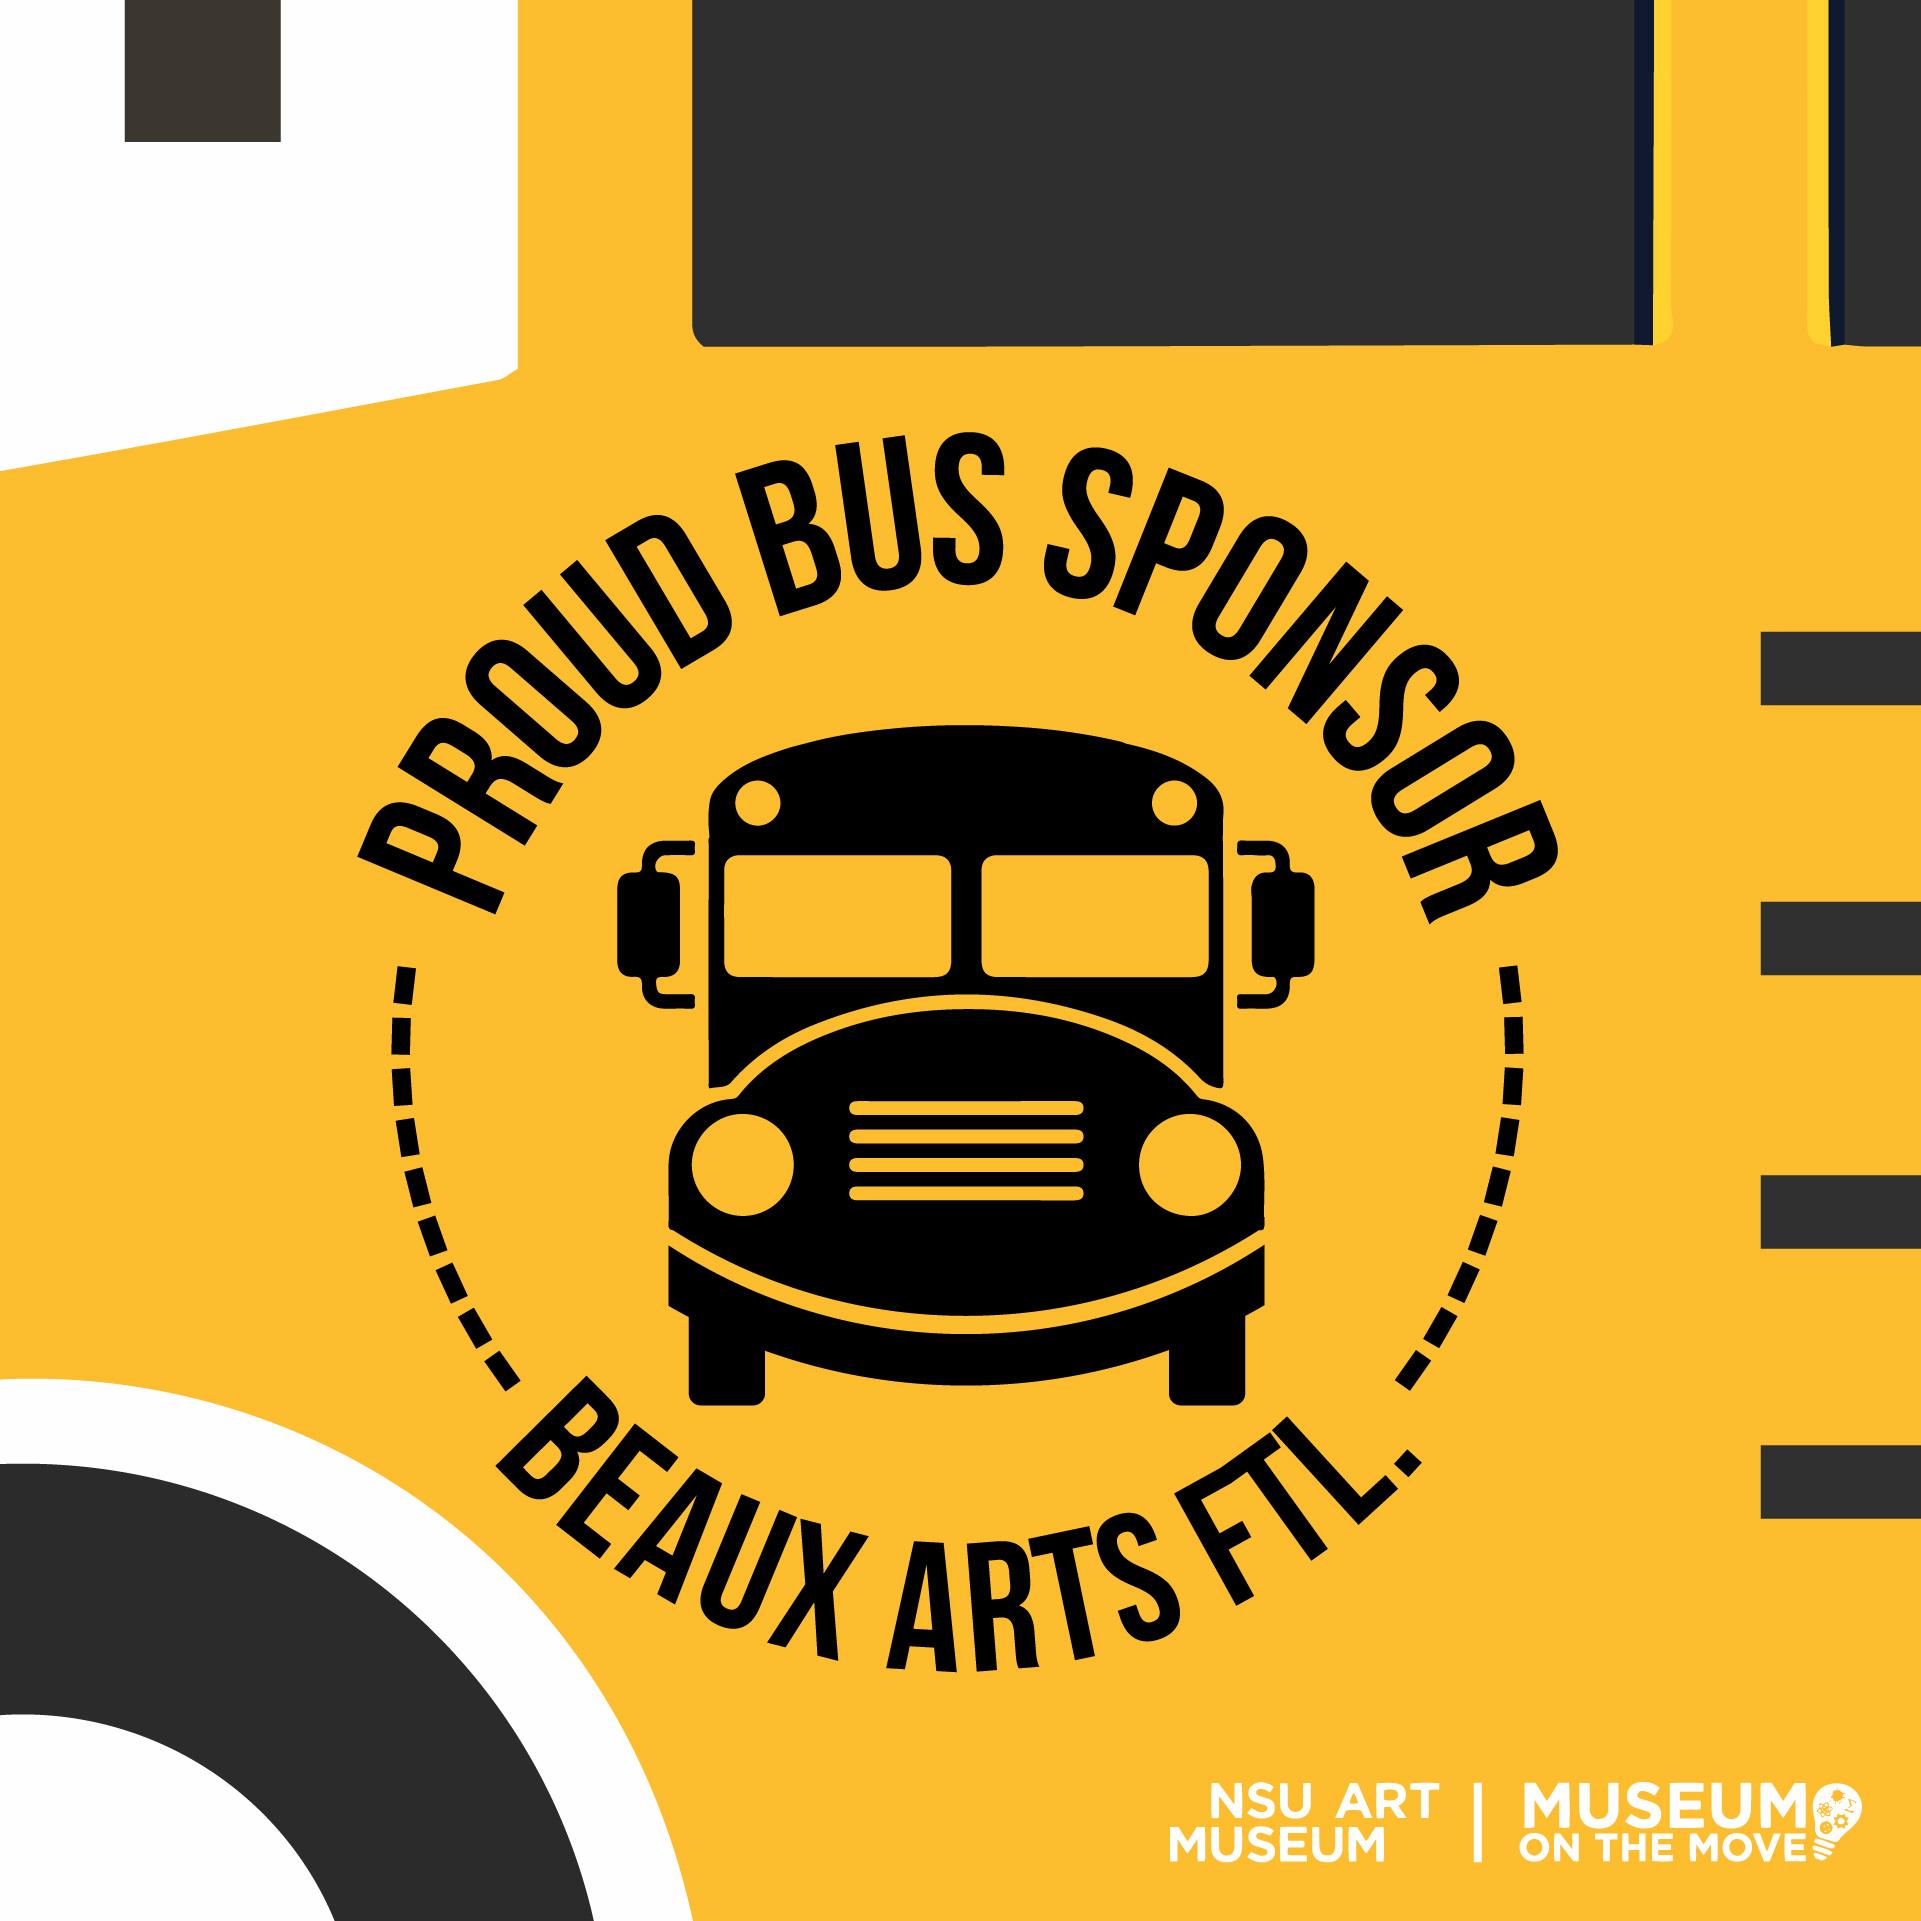 proud-bus-sponsor-icon.jpg